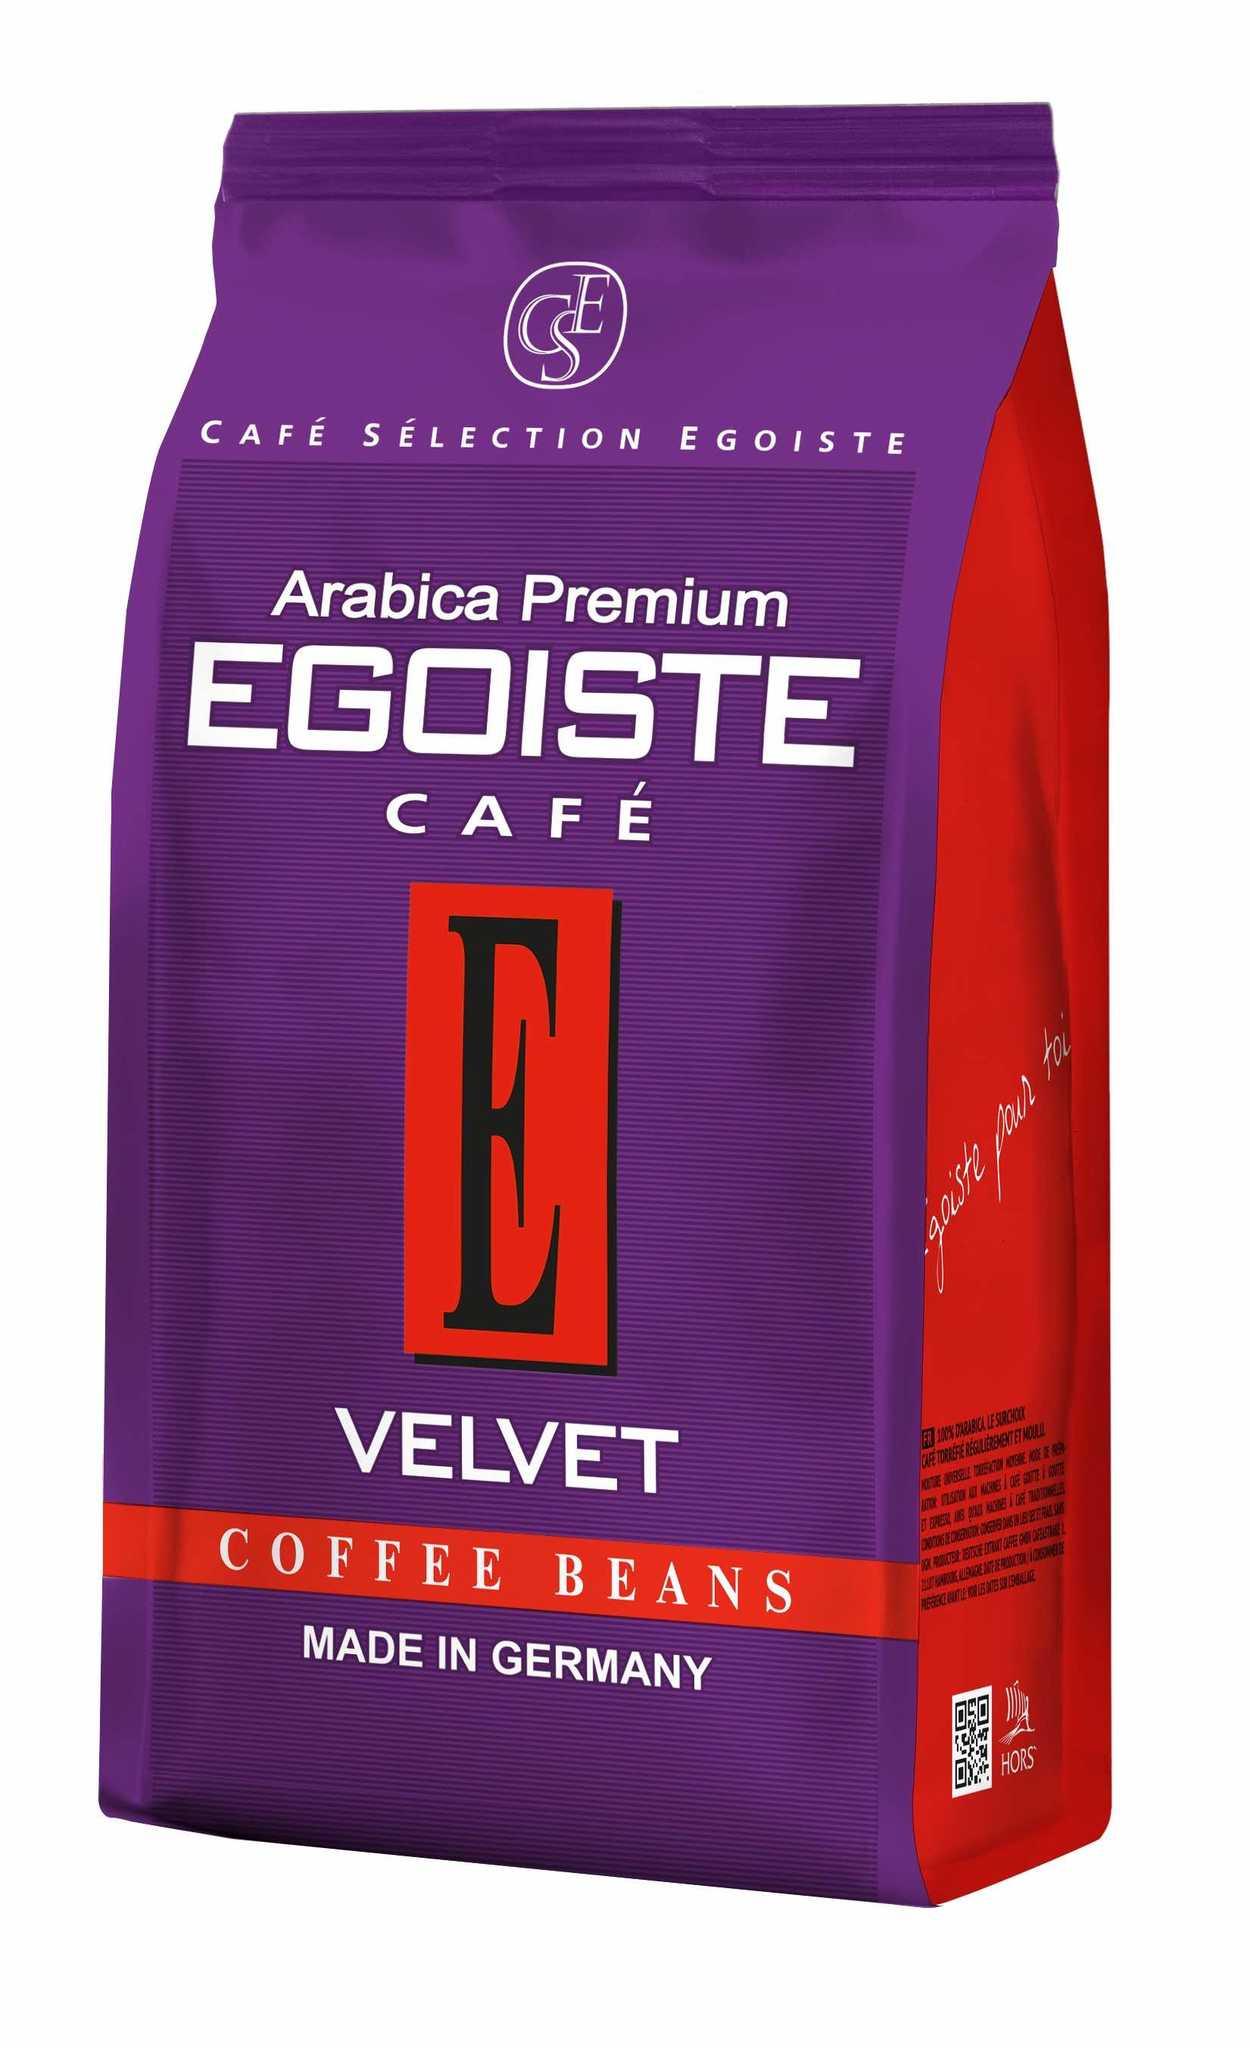 Кофе в зернах Кофе в зернах Velvet, Egoiste, 200 г import_files_0a_0a6e3d52cb2511eaa9ce484d7ecee297_2f451854cdab11eaa9ce484d7ecee297.jpg